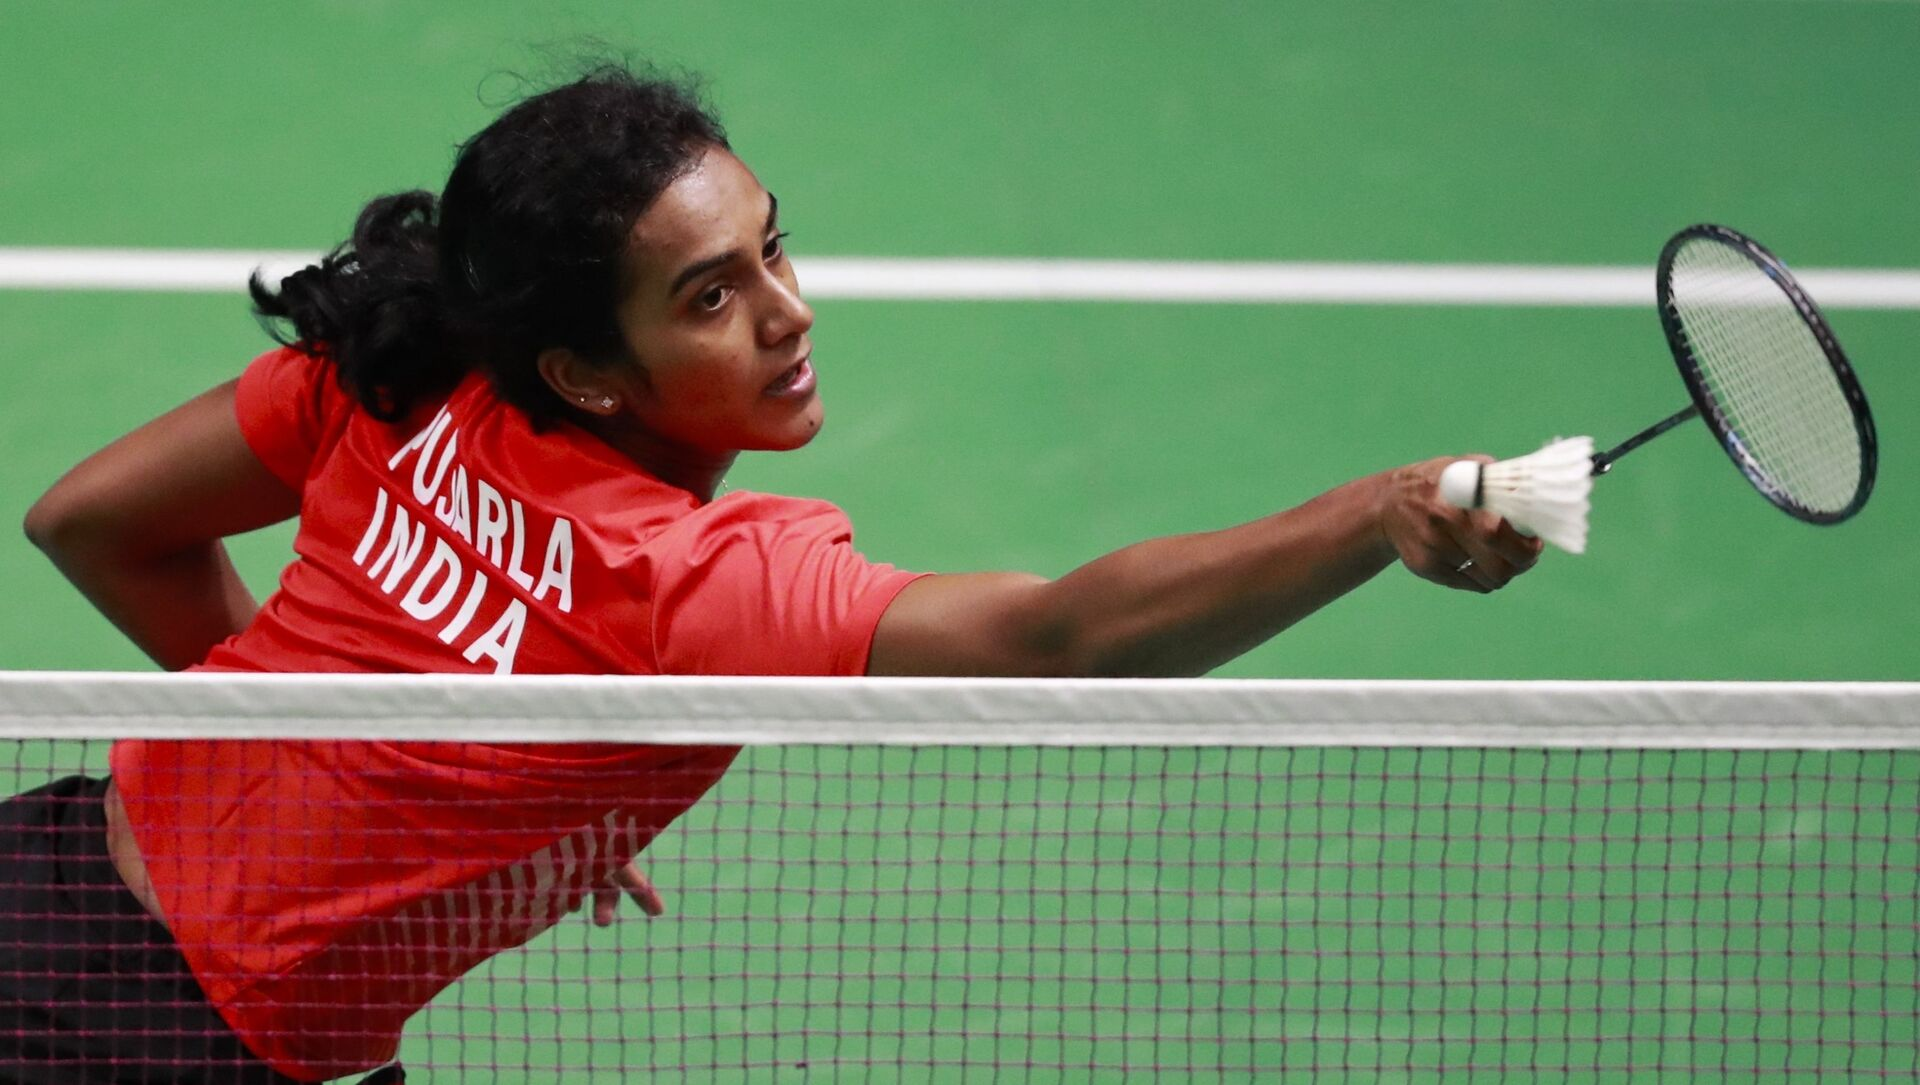 India's P.V. Sindhu returns the ball to Vietnam's Vu Thi Trang during their women's single badminton match at 18th Asian Games in Jakarta, Indonesia, Thursday, Aug. 23, 2018 - Sputnik International, 1920, 31.07.2021